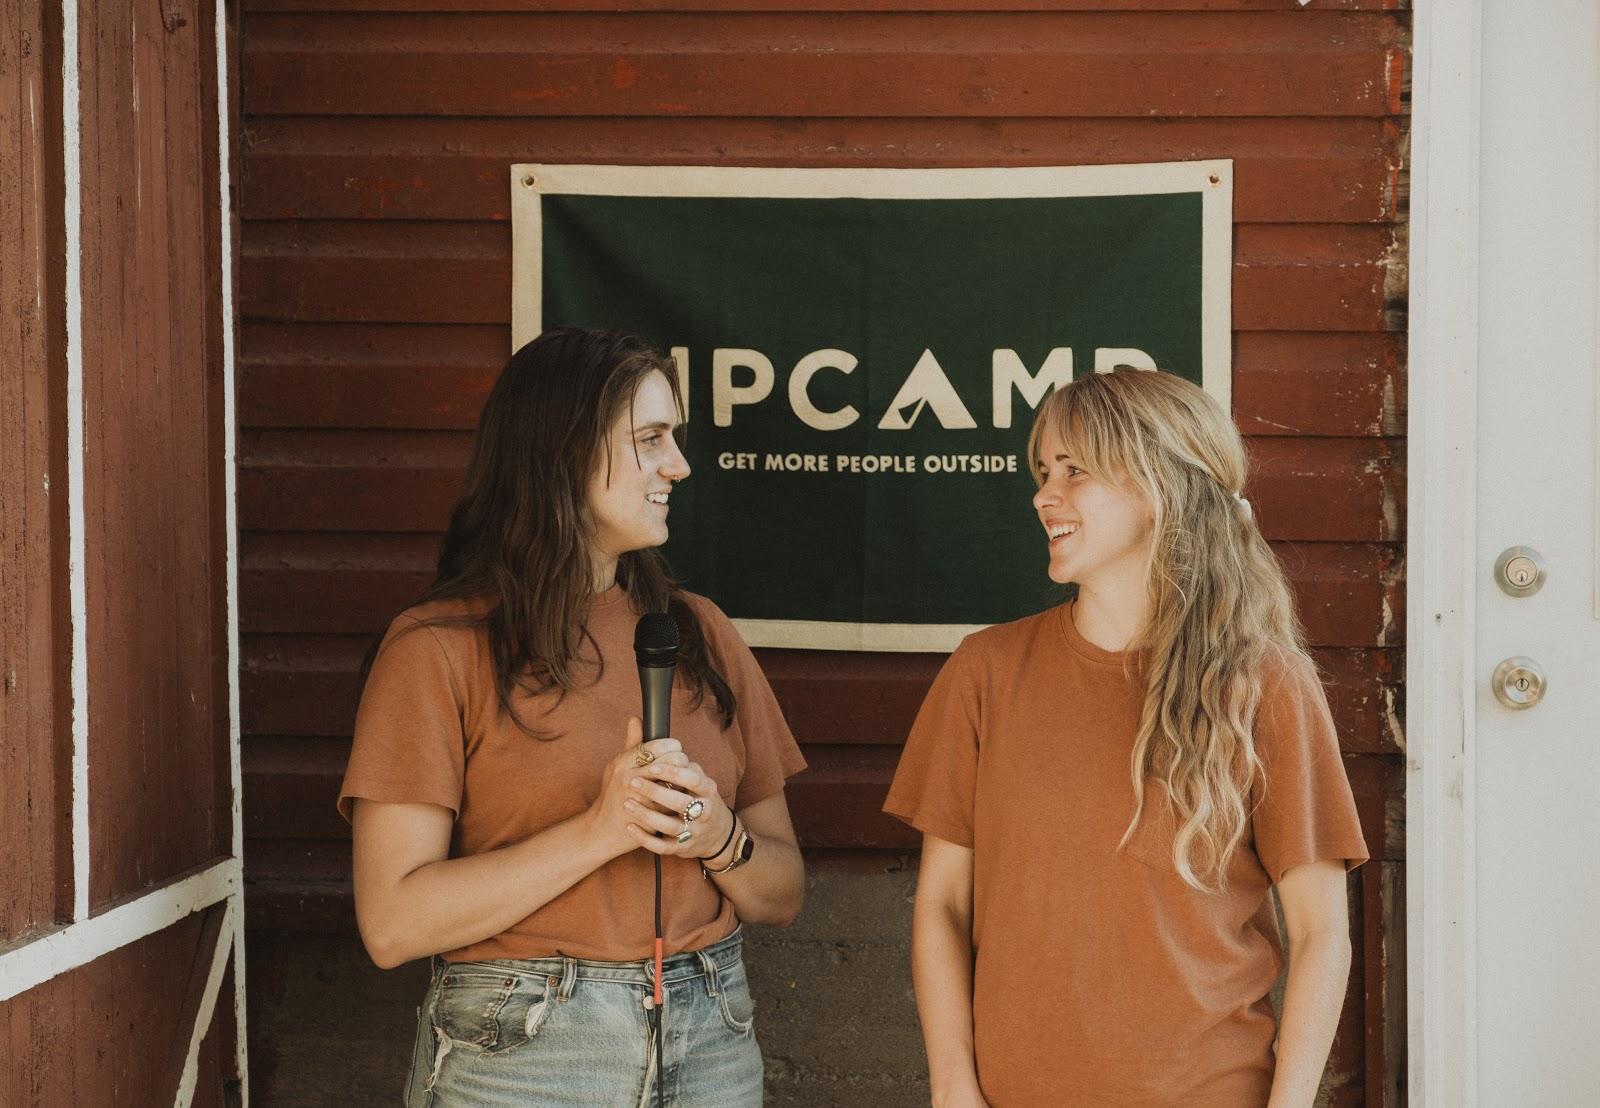 Alyssa Ravasio founder of Hipcamp on the left